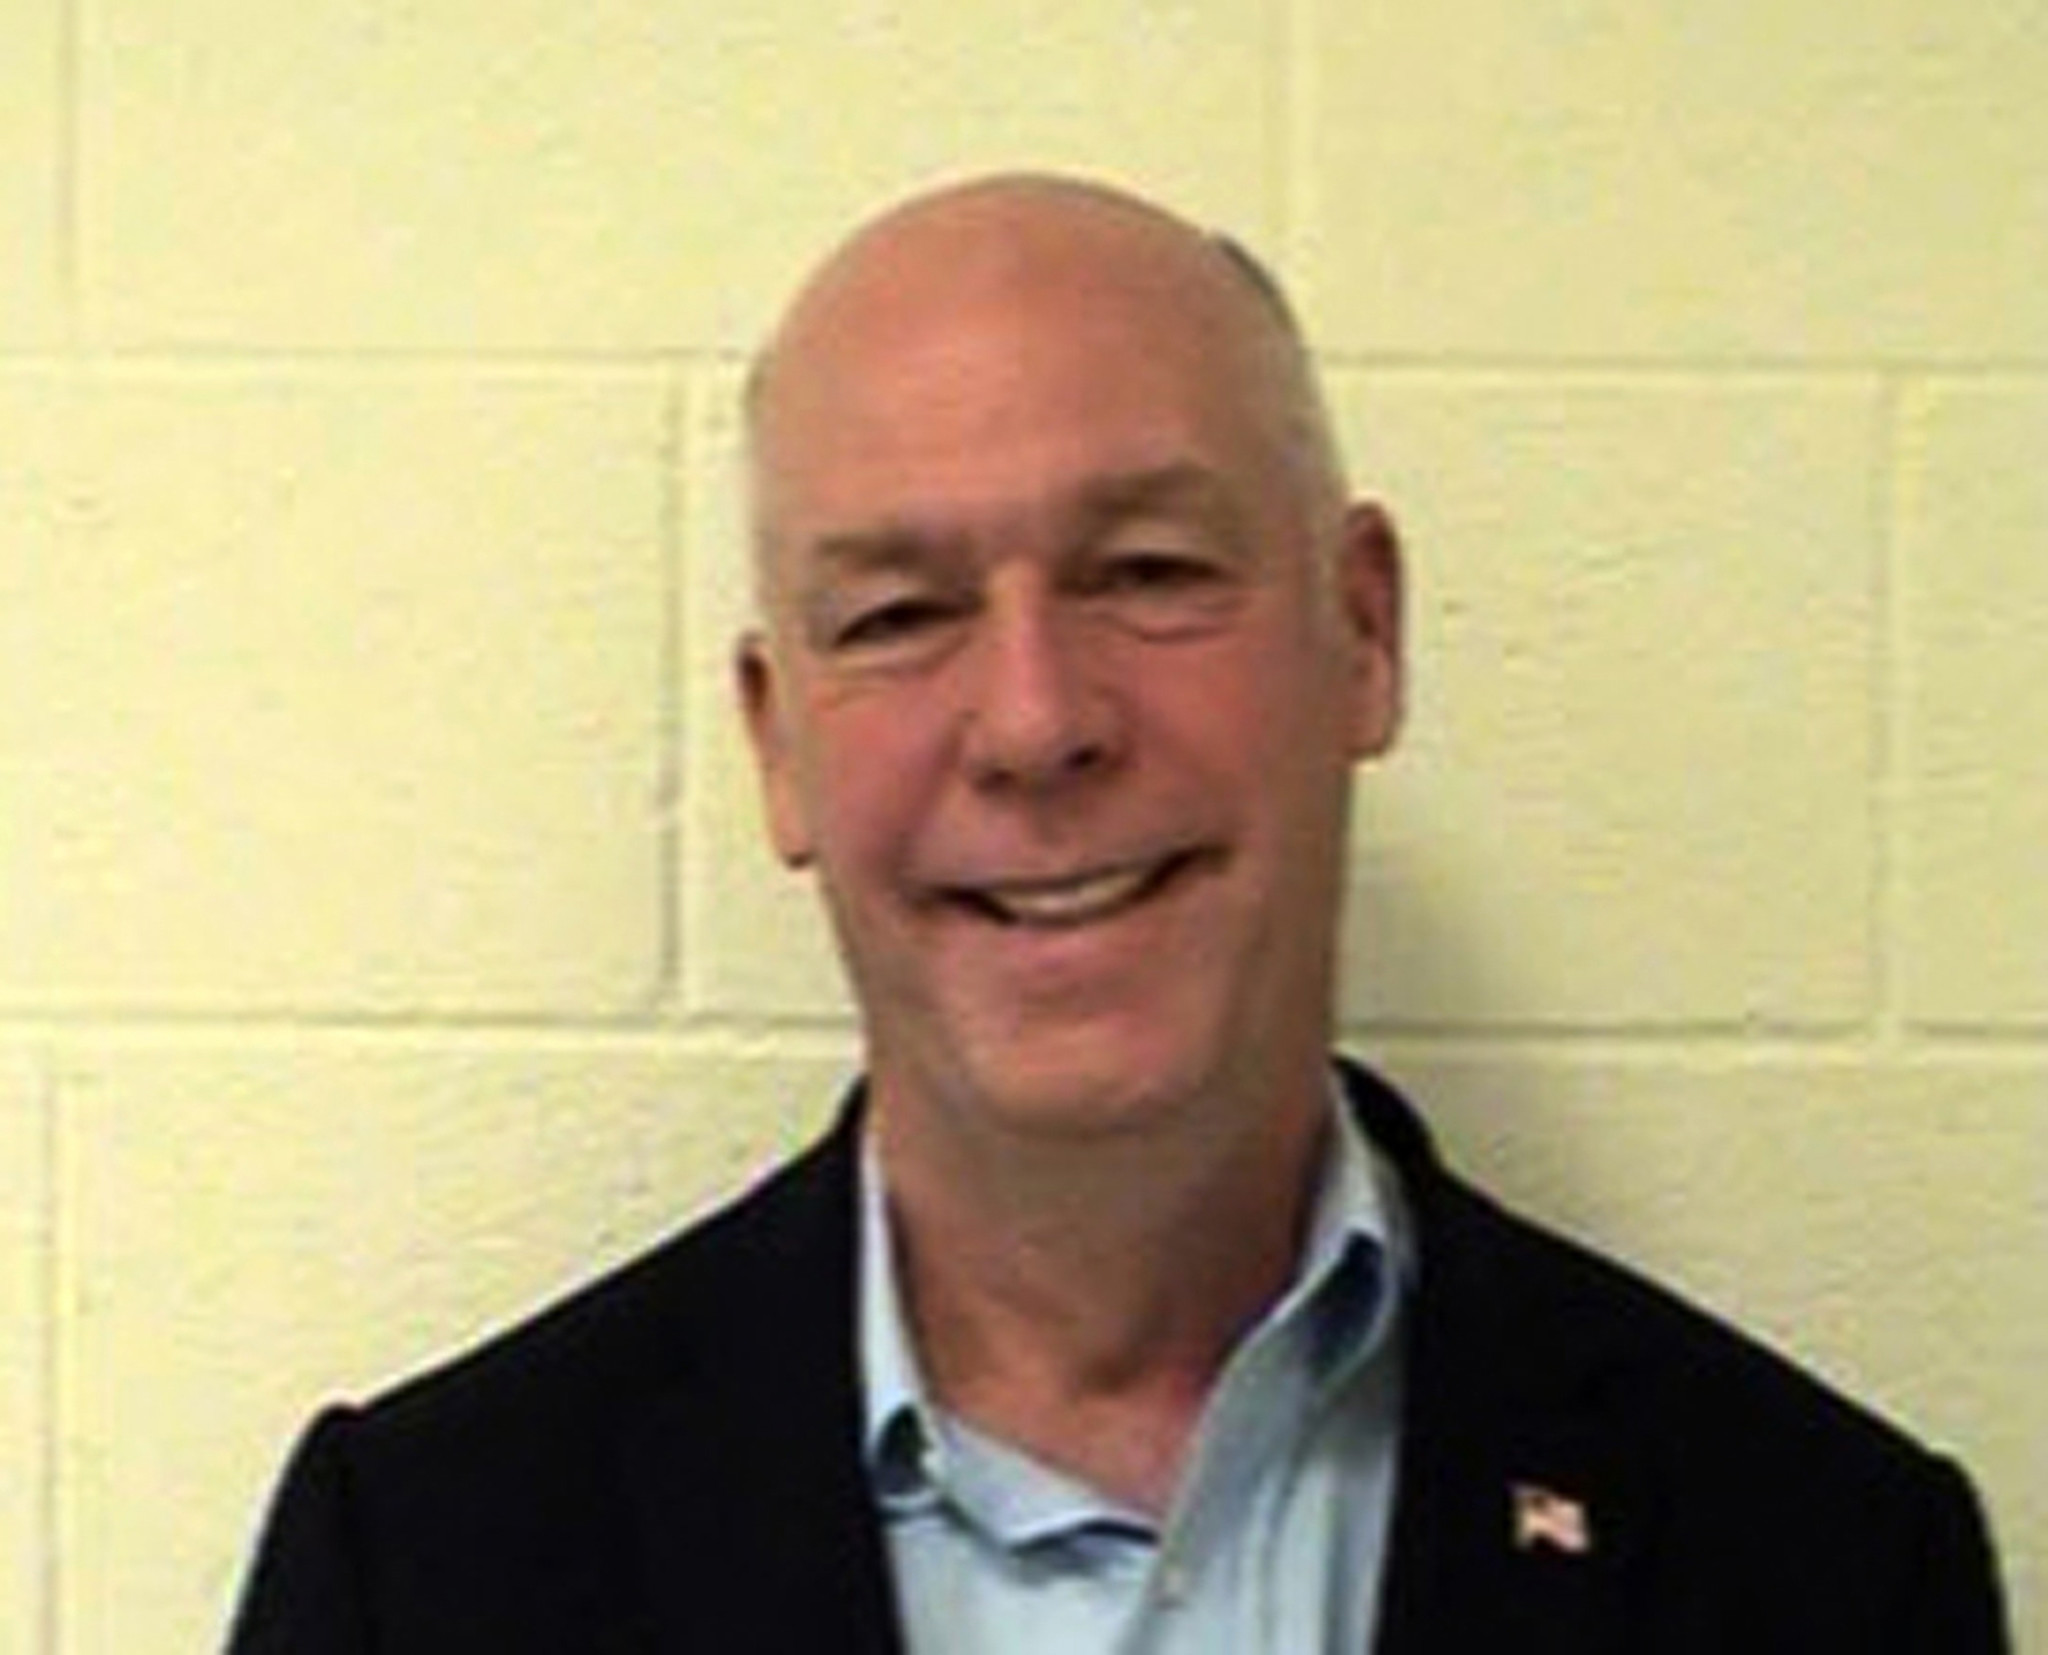 Montana Rep. Gianforte misled investigators in assault on reporter before election